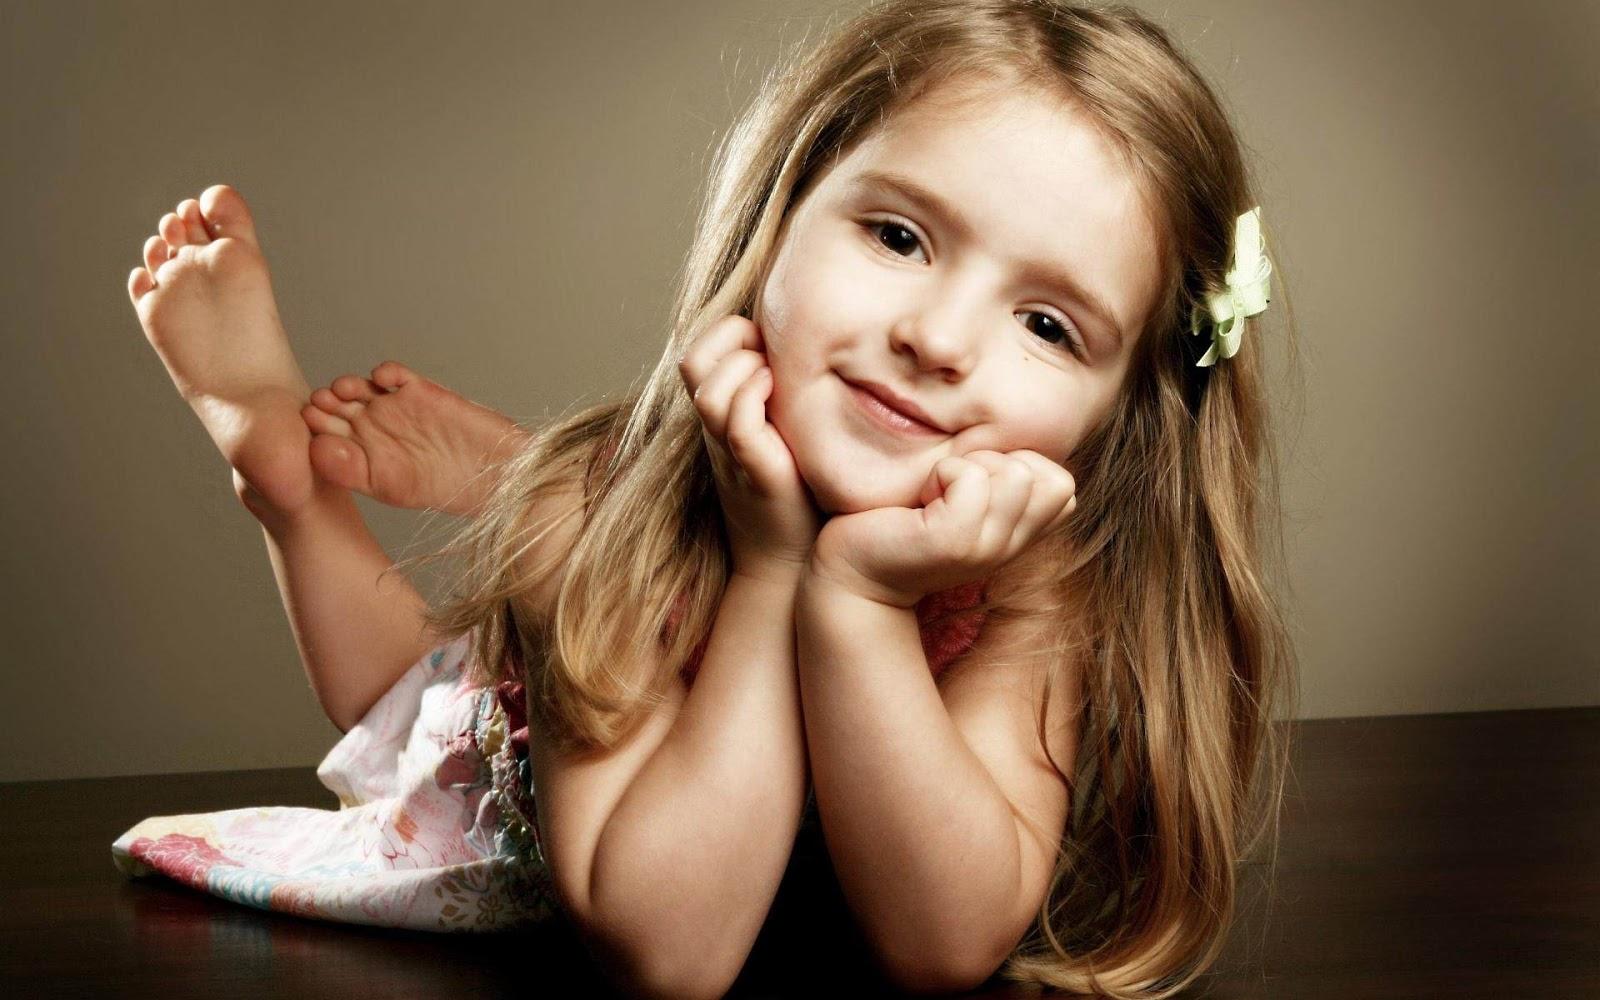 Cute Little Baby Girl HD Wallpaper 1920 X 1200